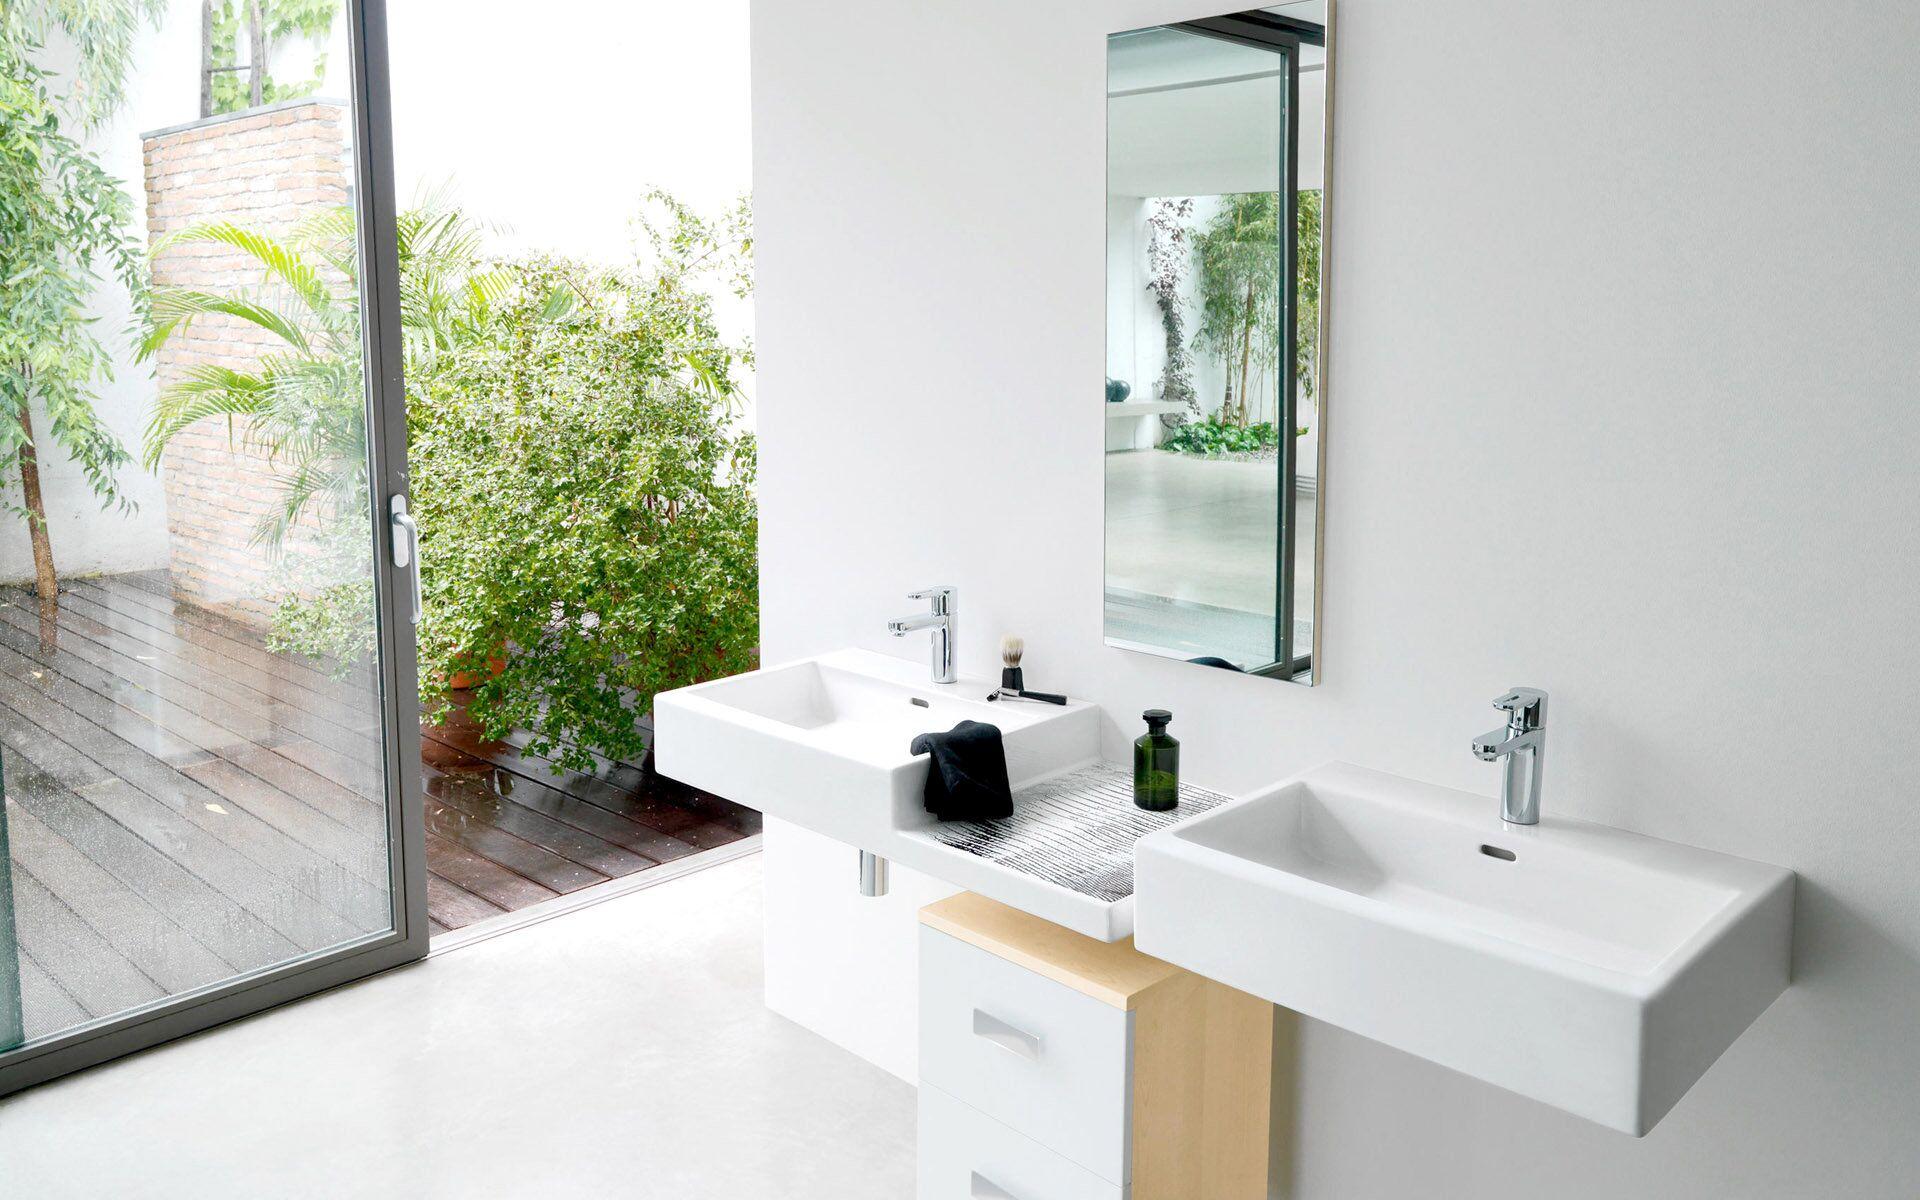 fashion oval ceramic basin order now for washroom-18